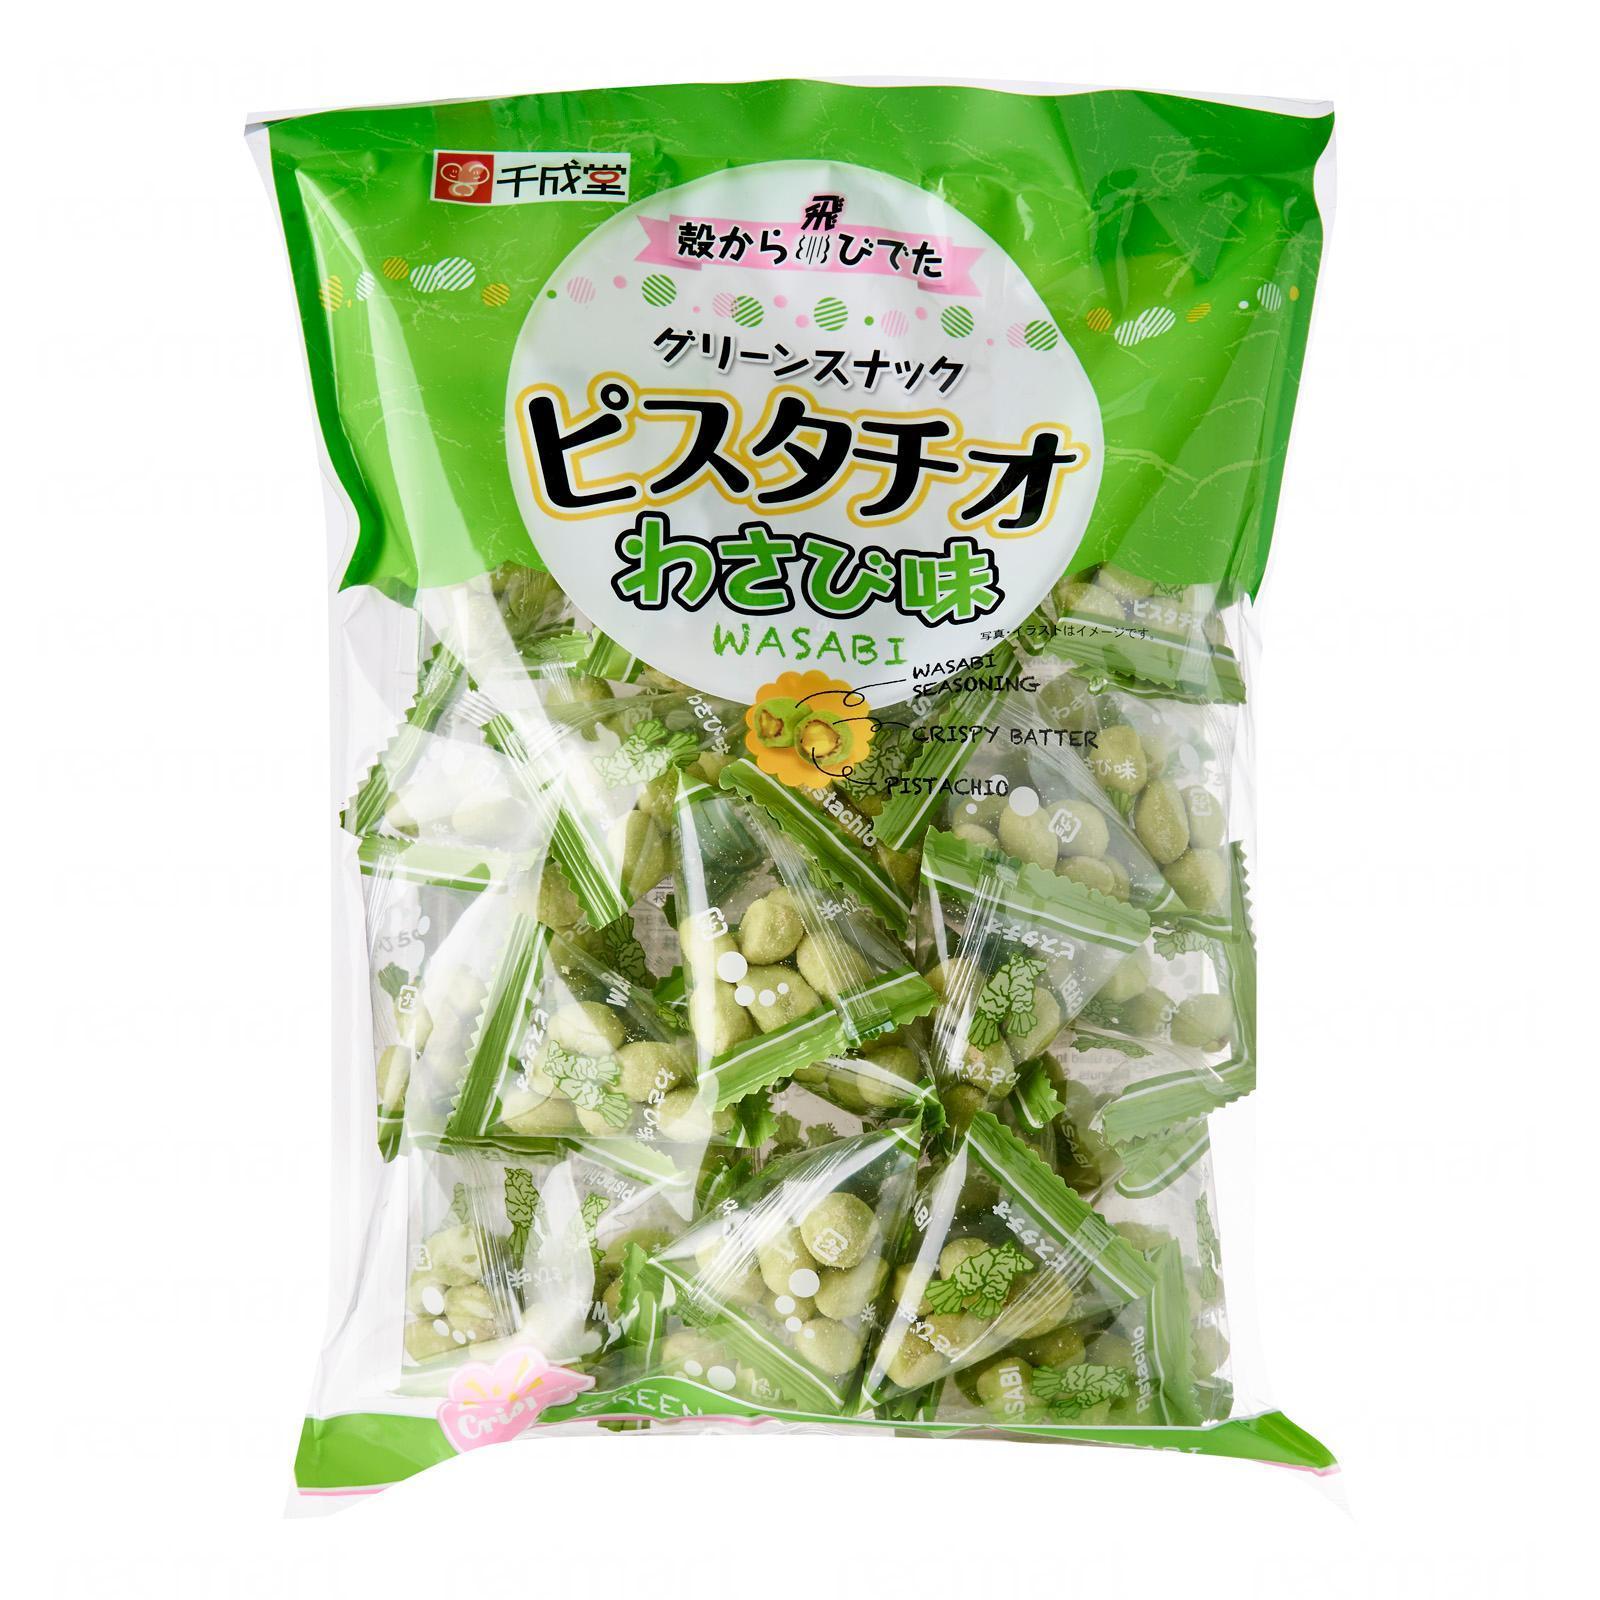 Sennarido Crispy Green Wasabi Pistachio Snack - Jetro Special